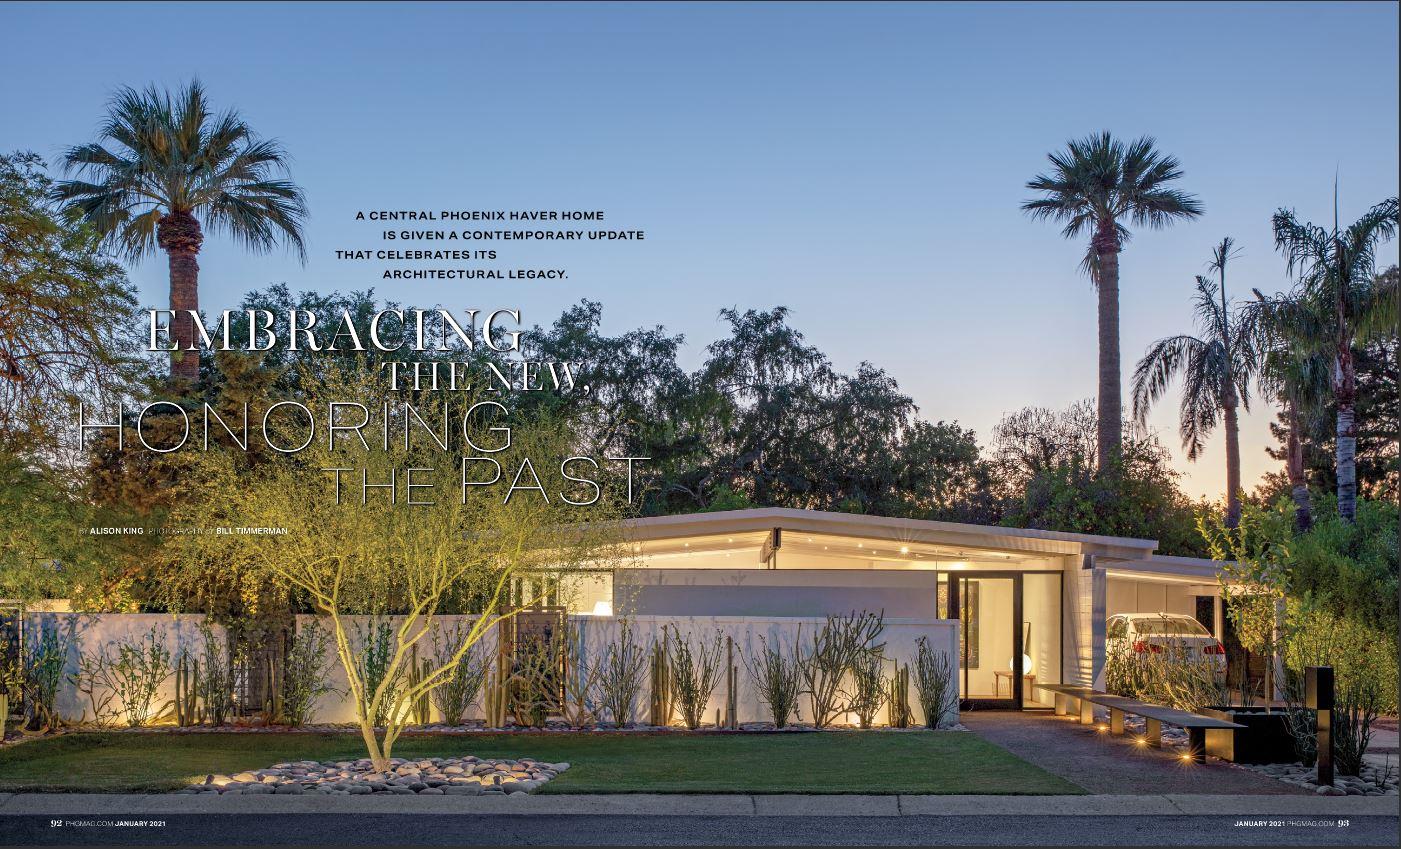 Phoenix Home & Garden: Embracing the New P1